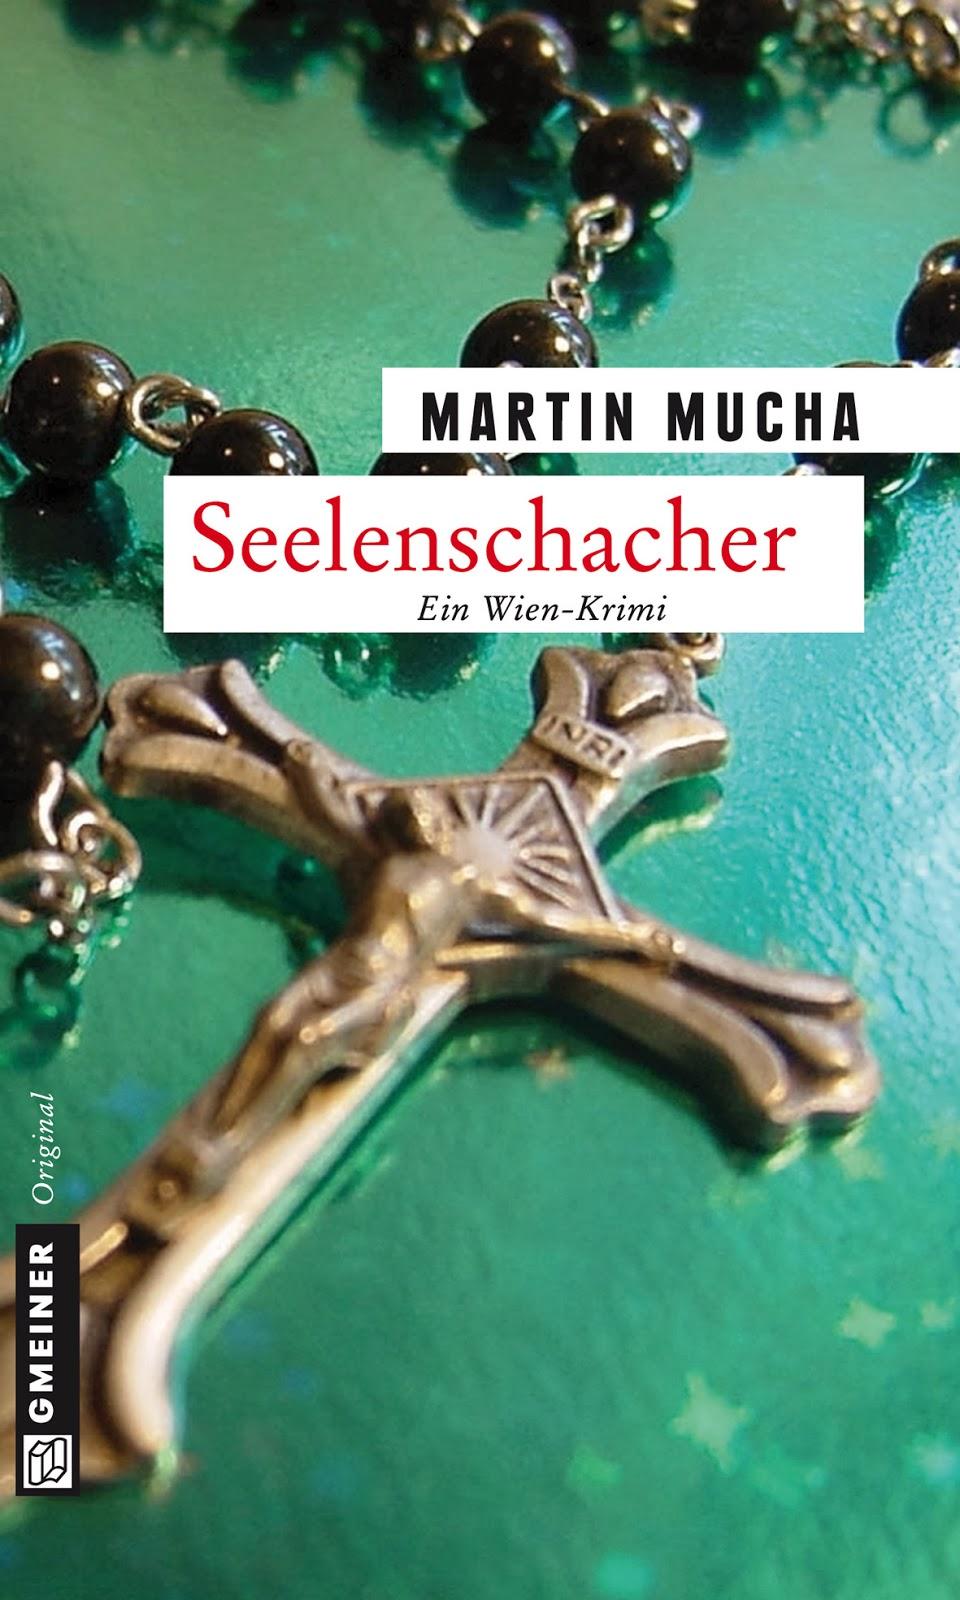 http://www.gmeiner-verlag.de/programm/titel/385-seelenschacher.html